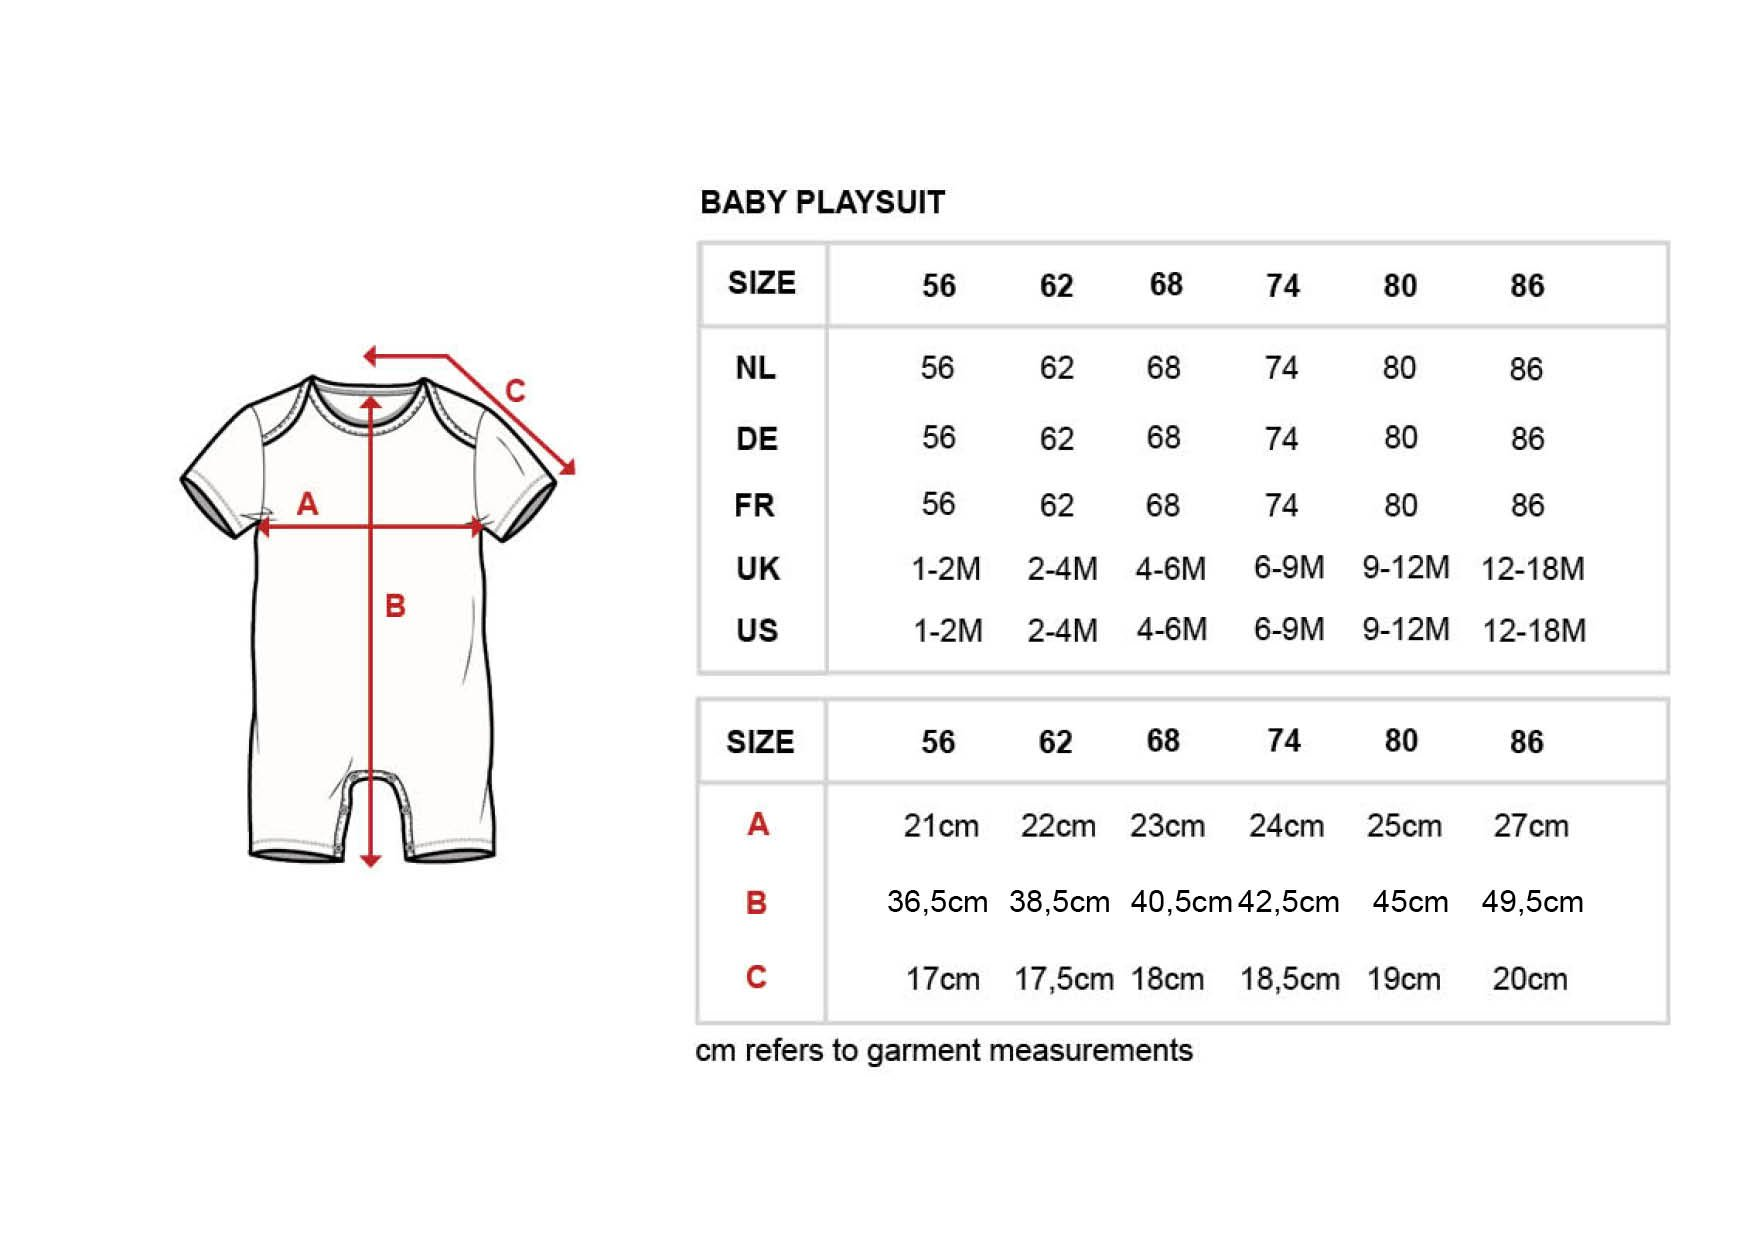 babyplaysuit